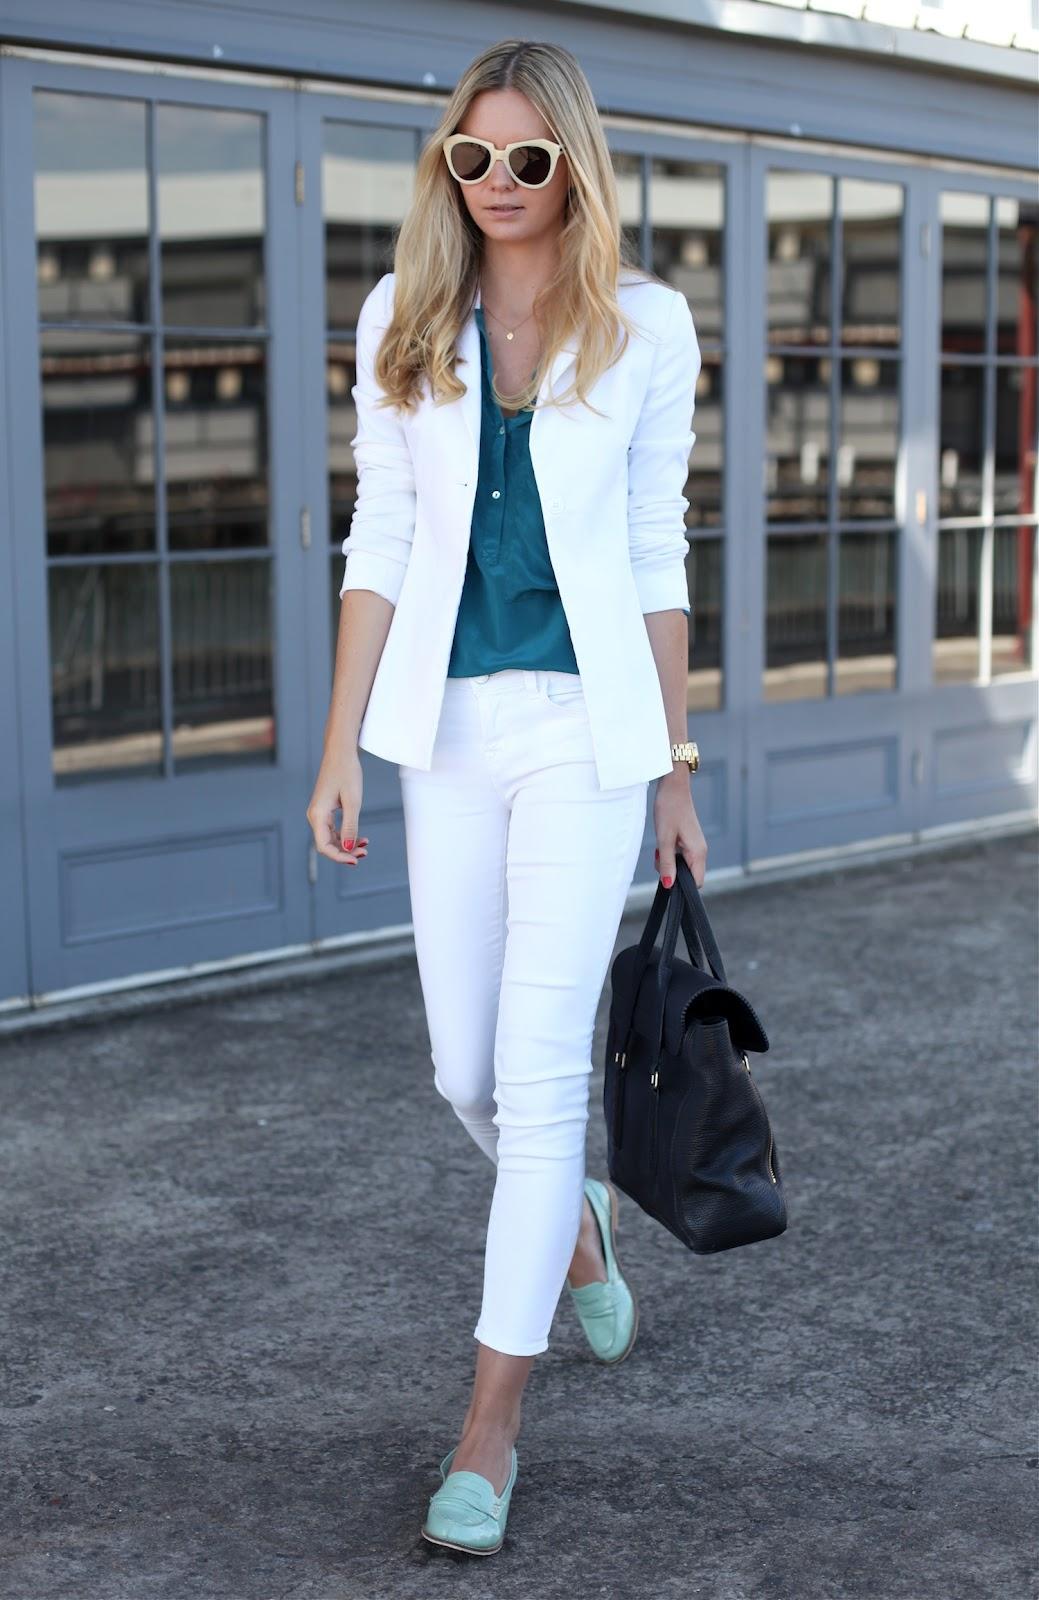 Туфли лоферы с белыми брюками – фото новинки